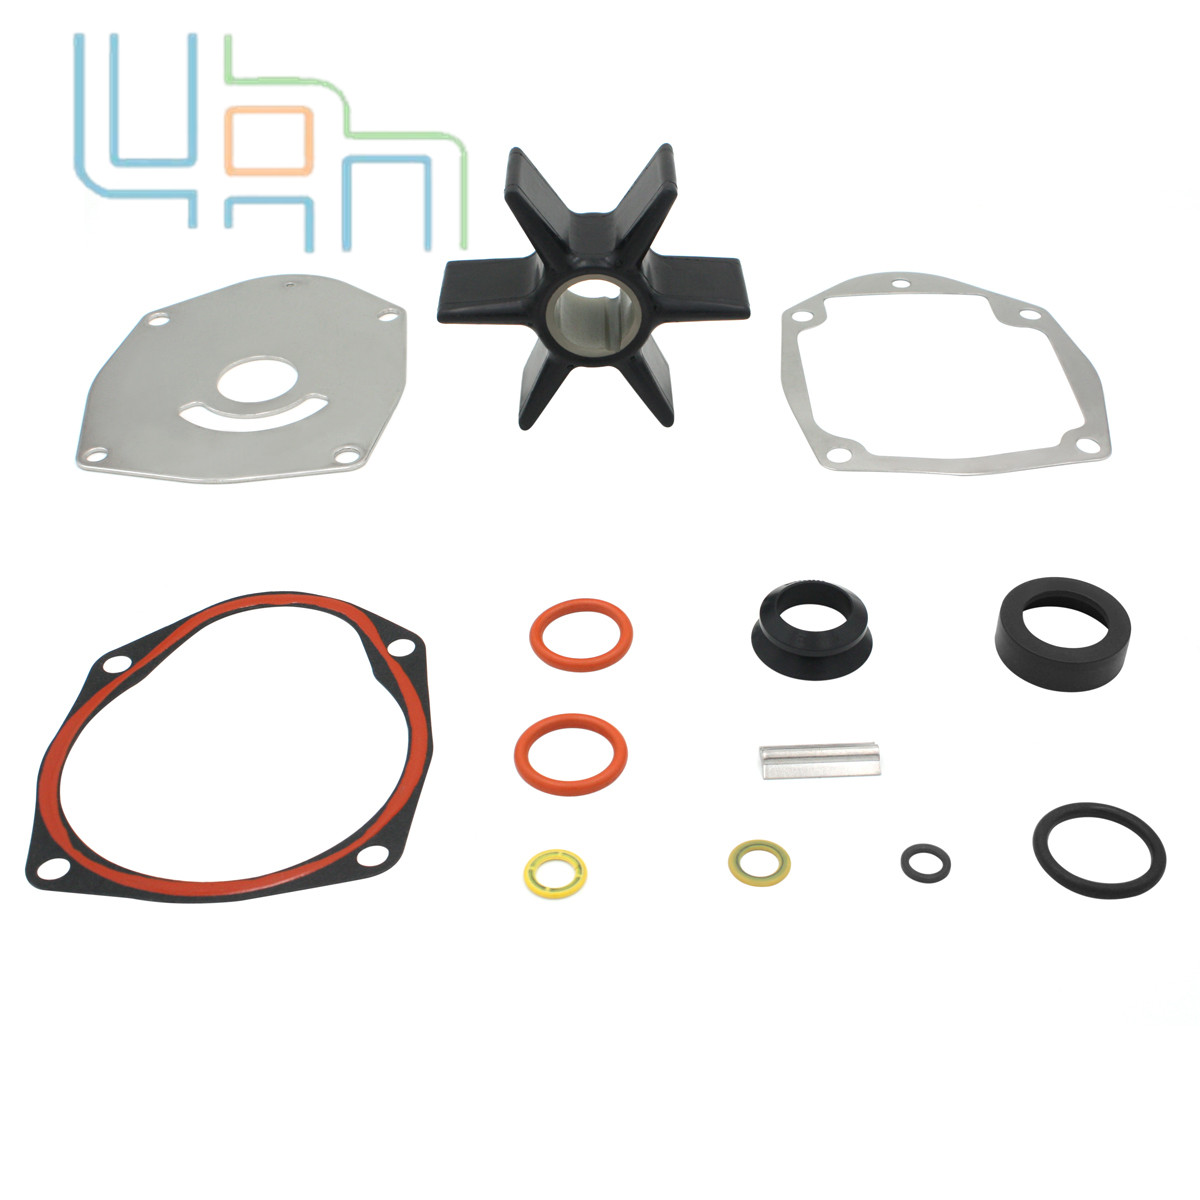 Water Pump Impeller Repair Kit For Mercury Mercruiser 47-8M0100526 47-43026Q06